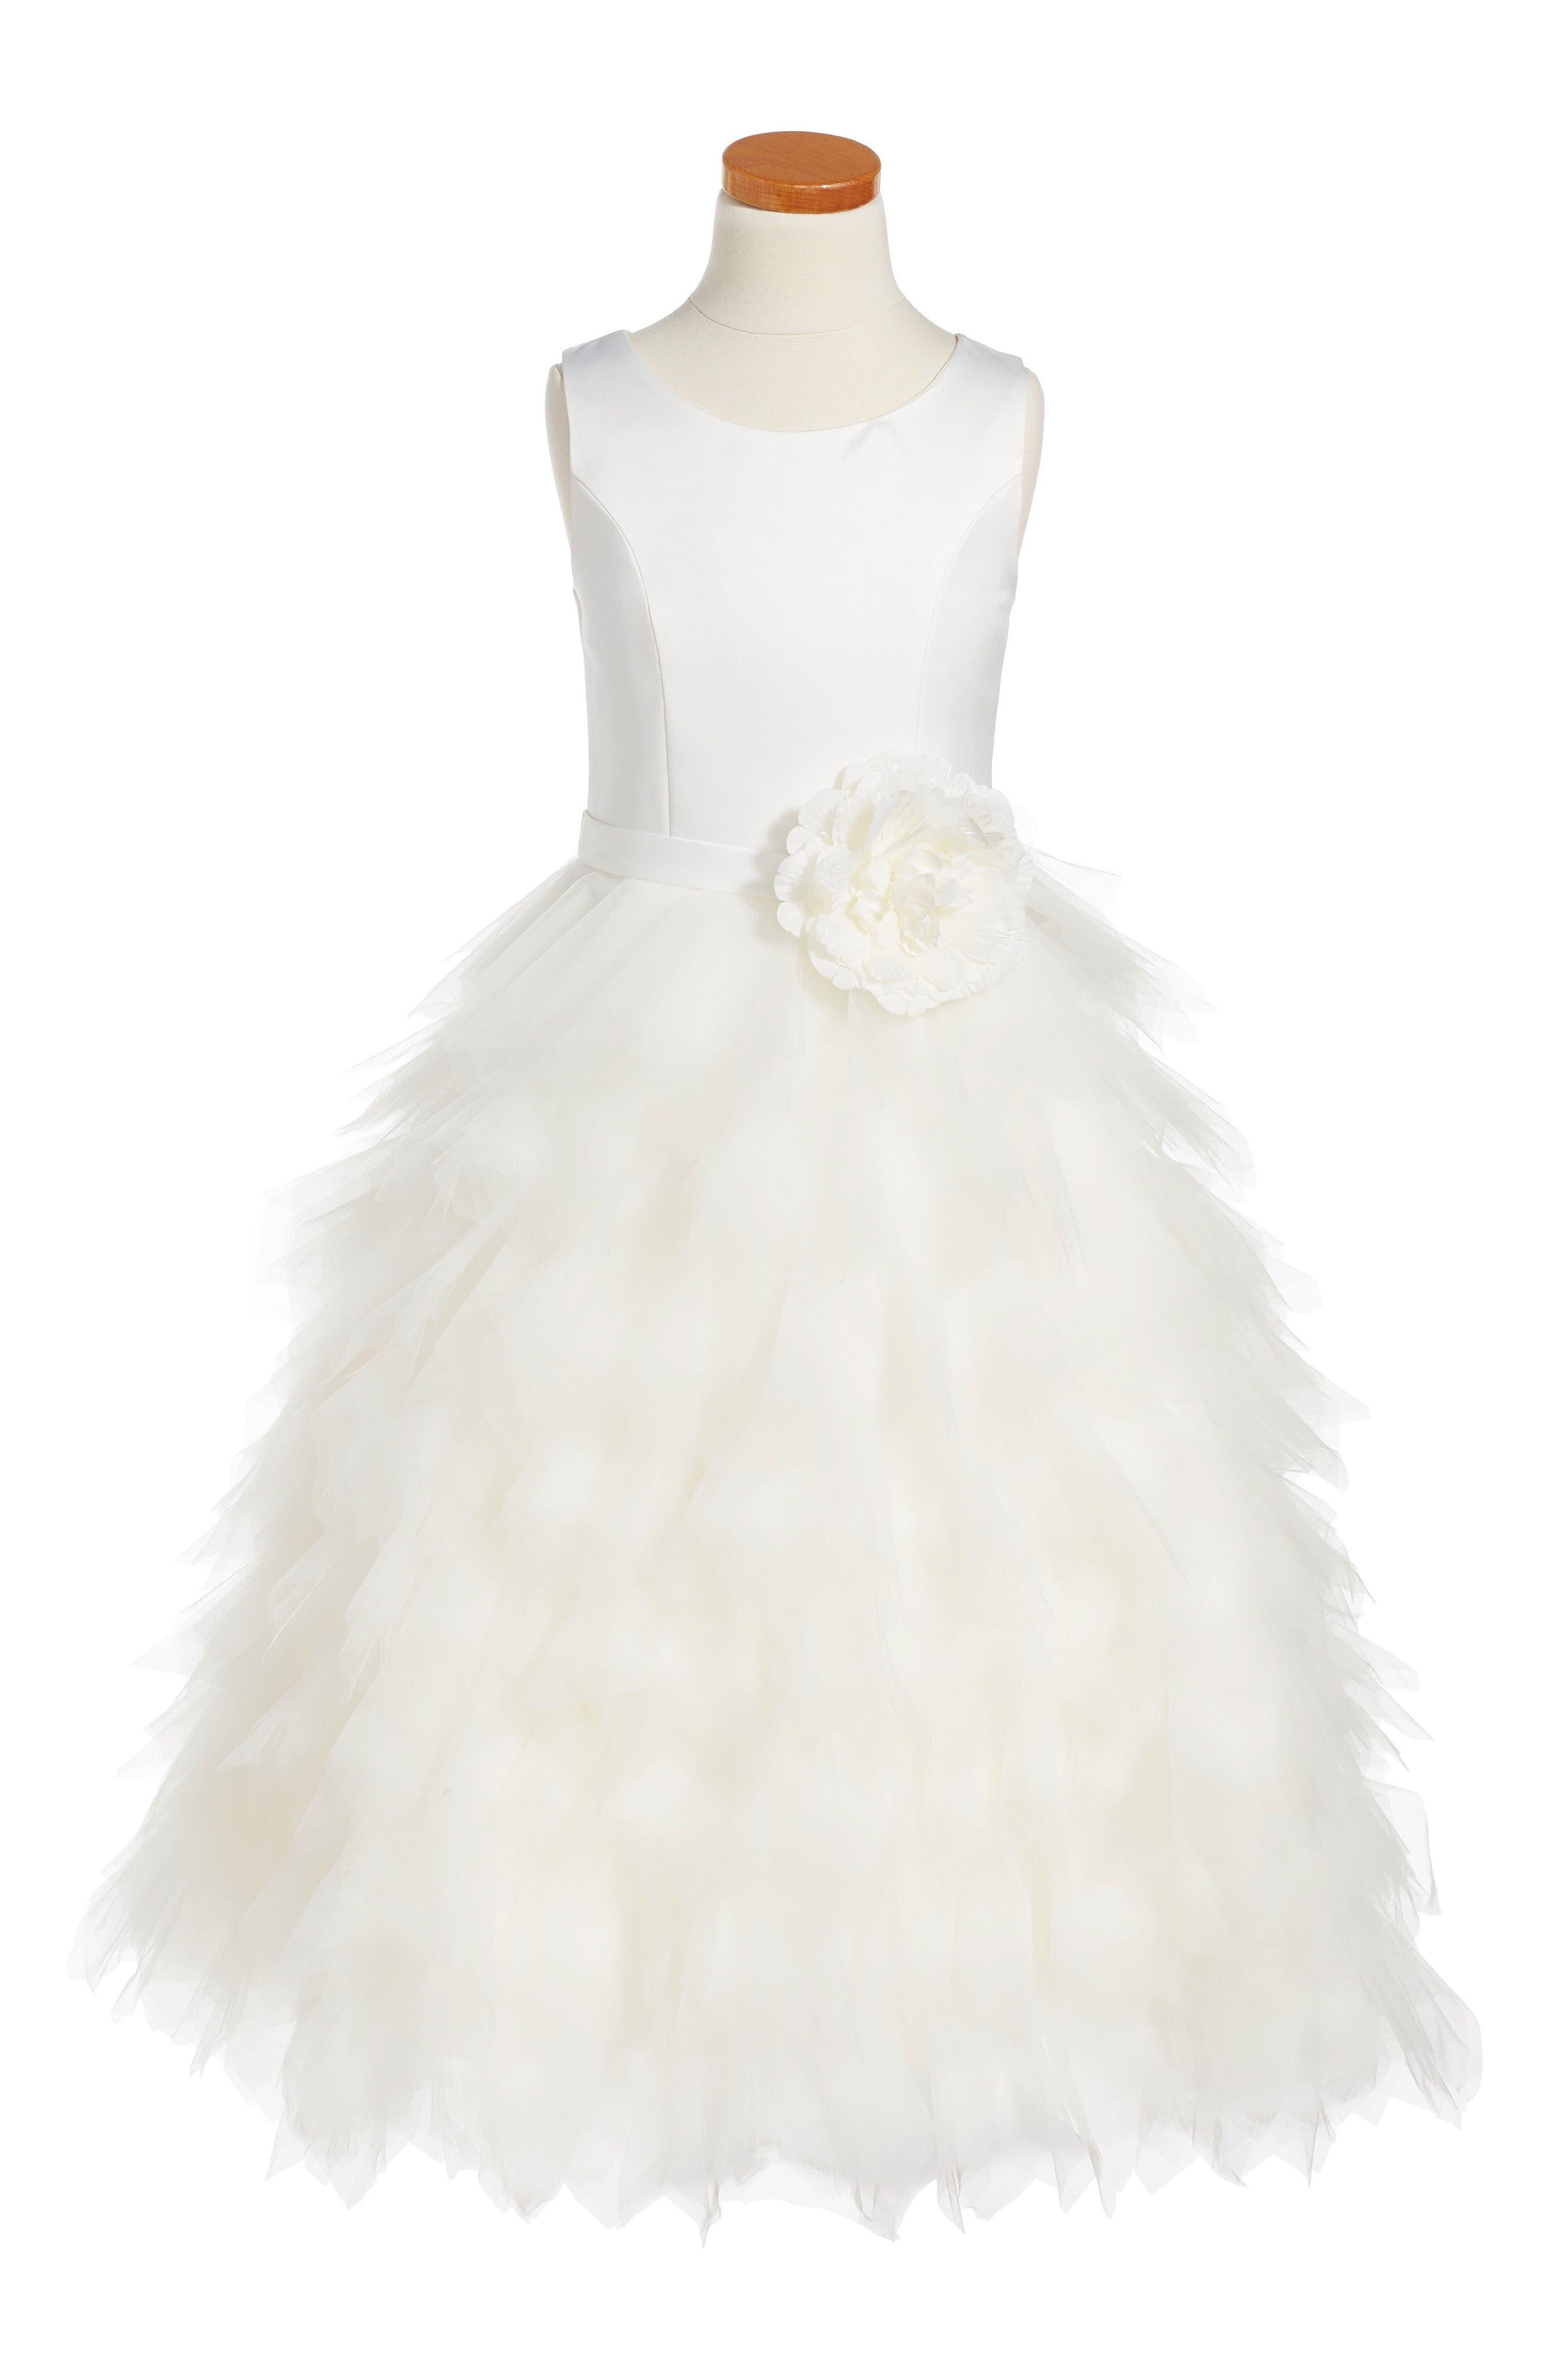 Main Image - Us Angels Satin & Tulle Dress (Toddler Girls, Little Girls & Big Girls)